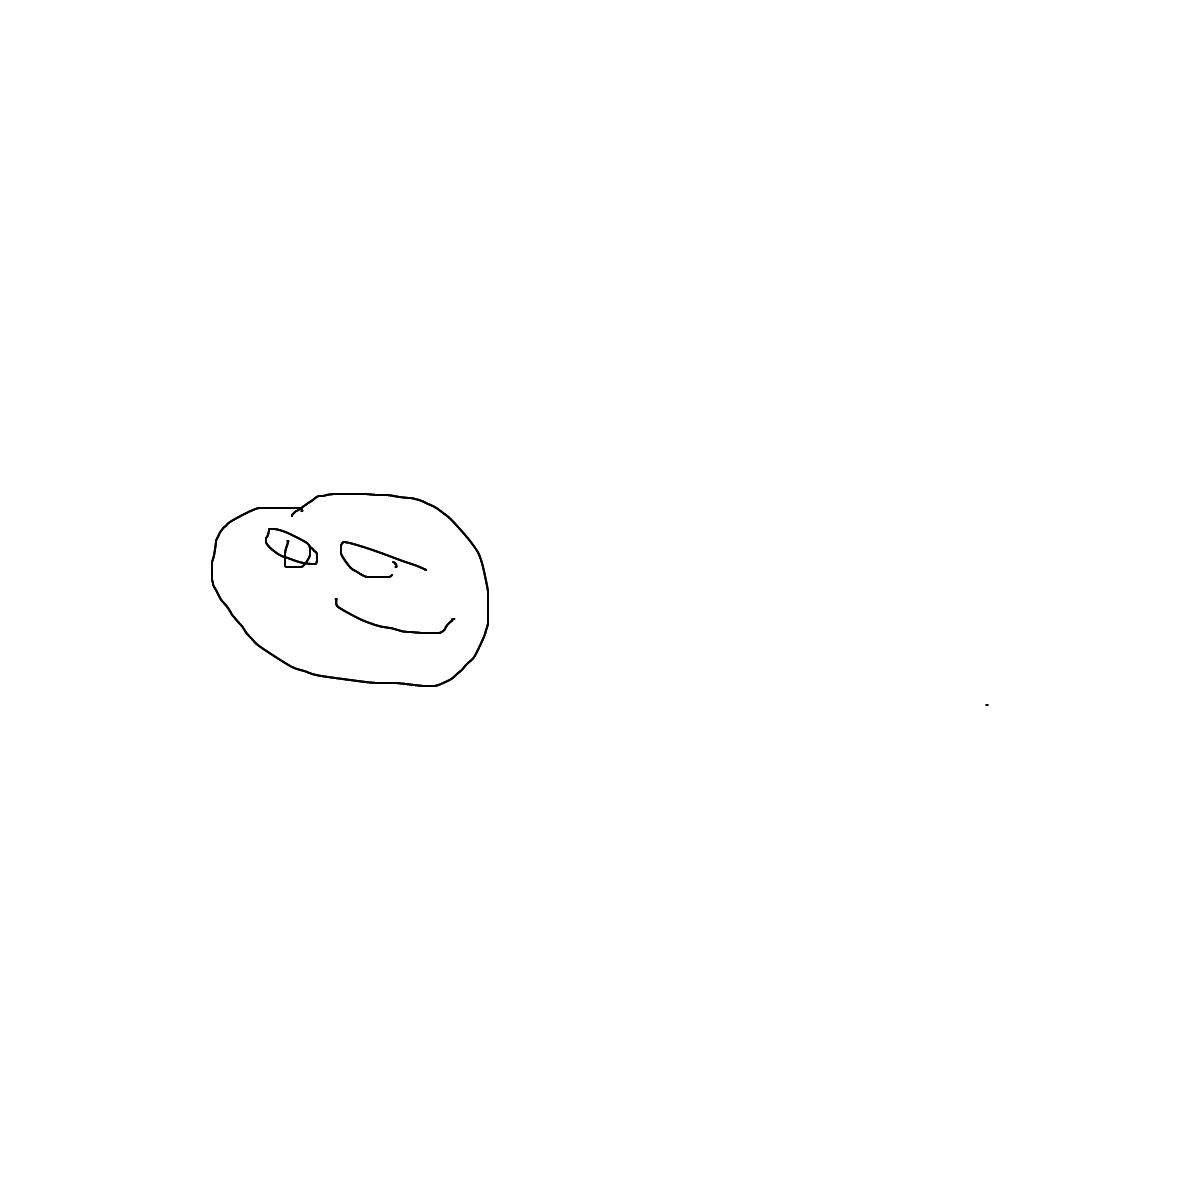 BAAAM drawing#7993 lat:64.5295486450195300lng: 26.3671989440917970